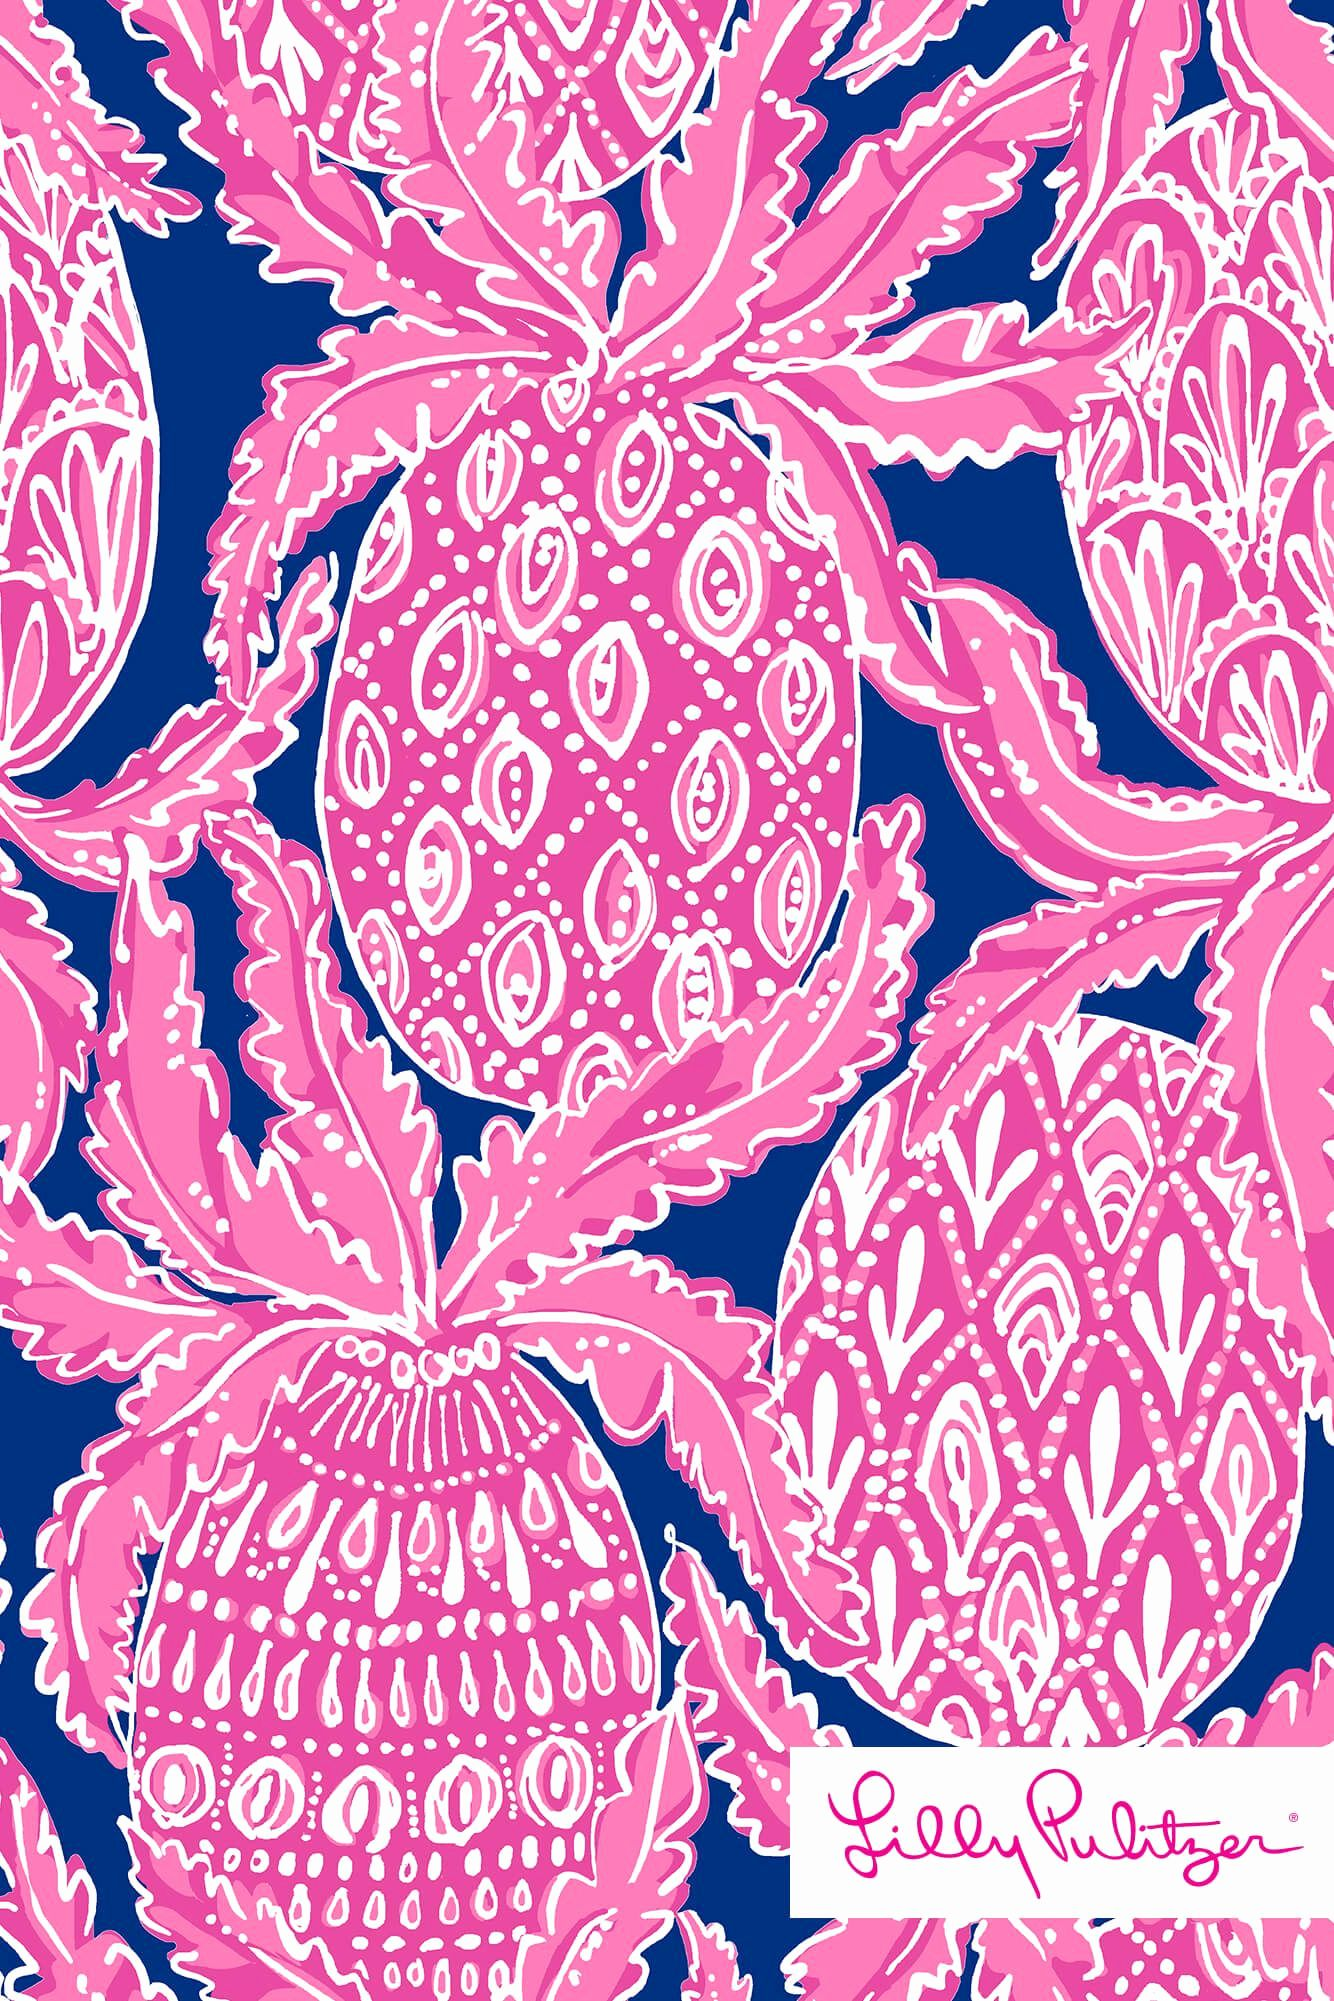 736x1377 Monogram Iphone Wallpaper Kappa Alpha Theta Lilly